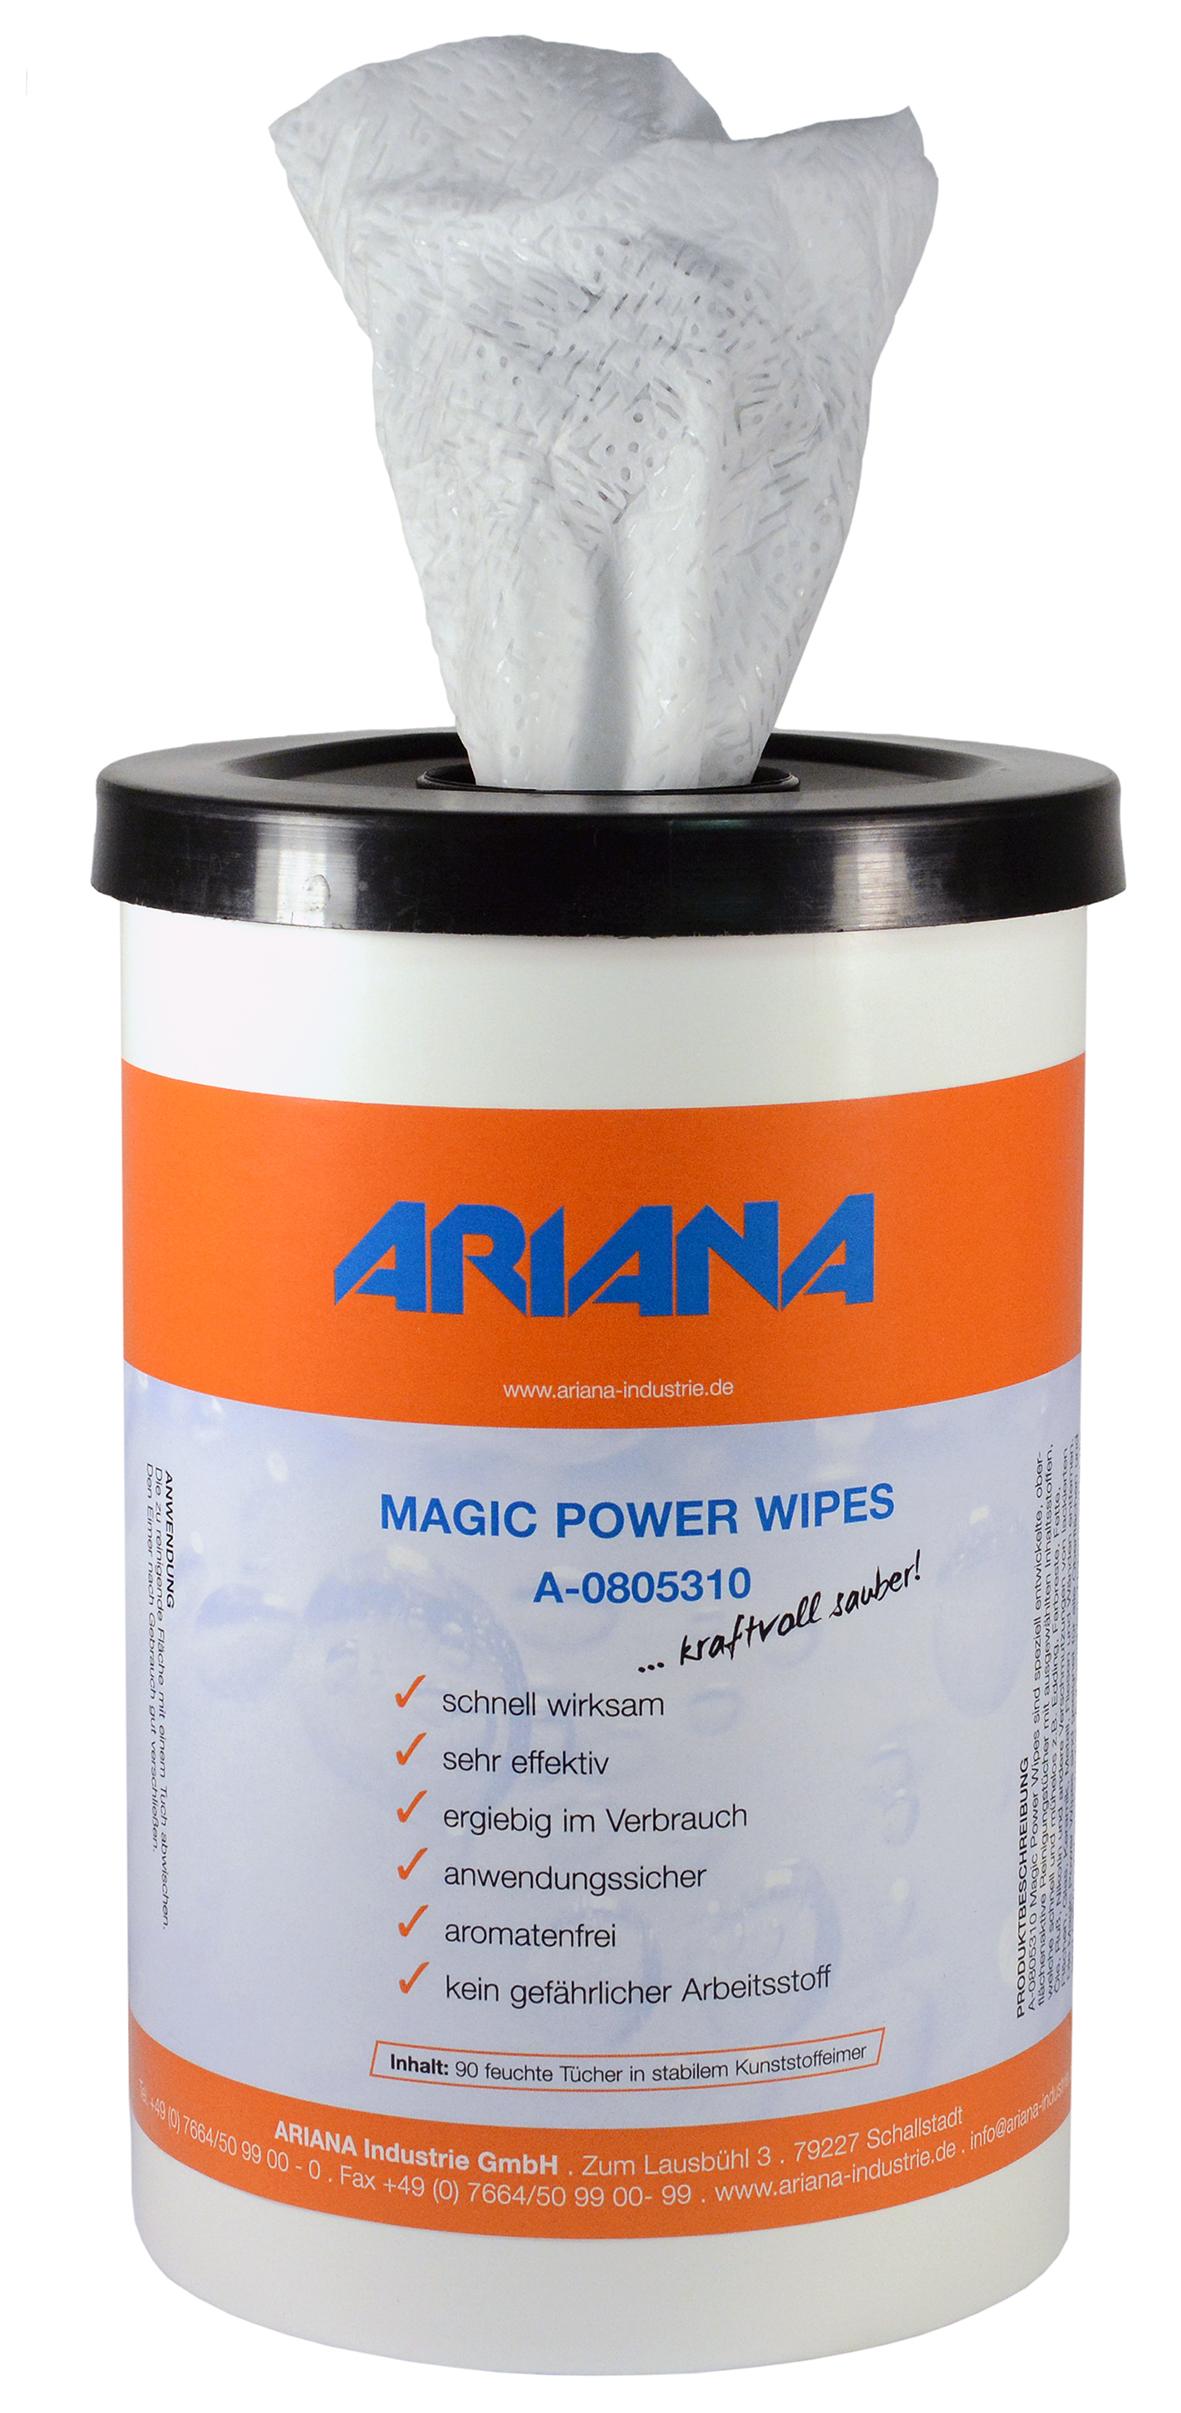 Reinigungstücher  Edding entfernen uvm  Magic Powe